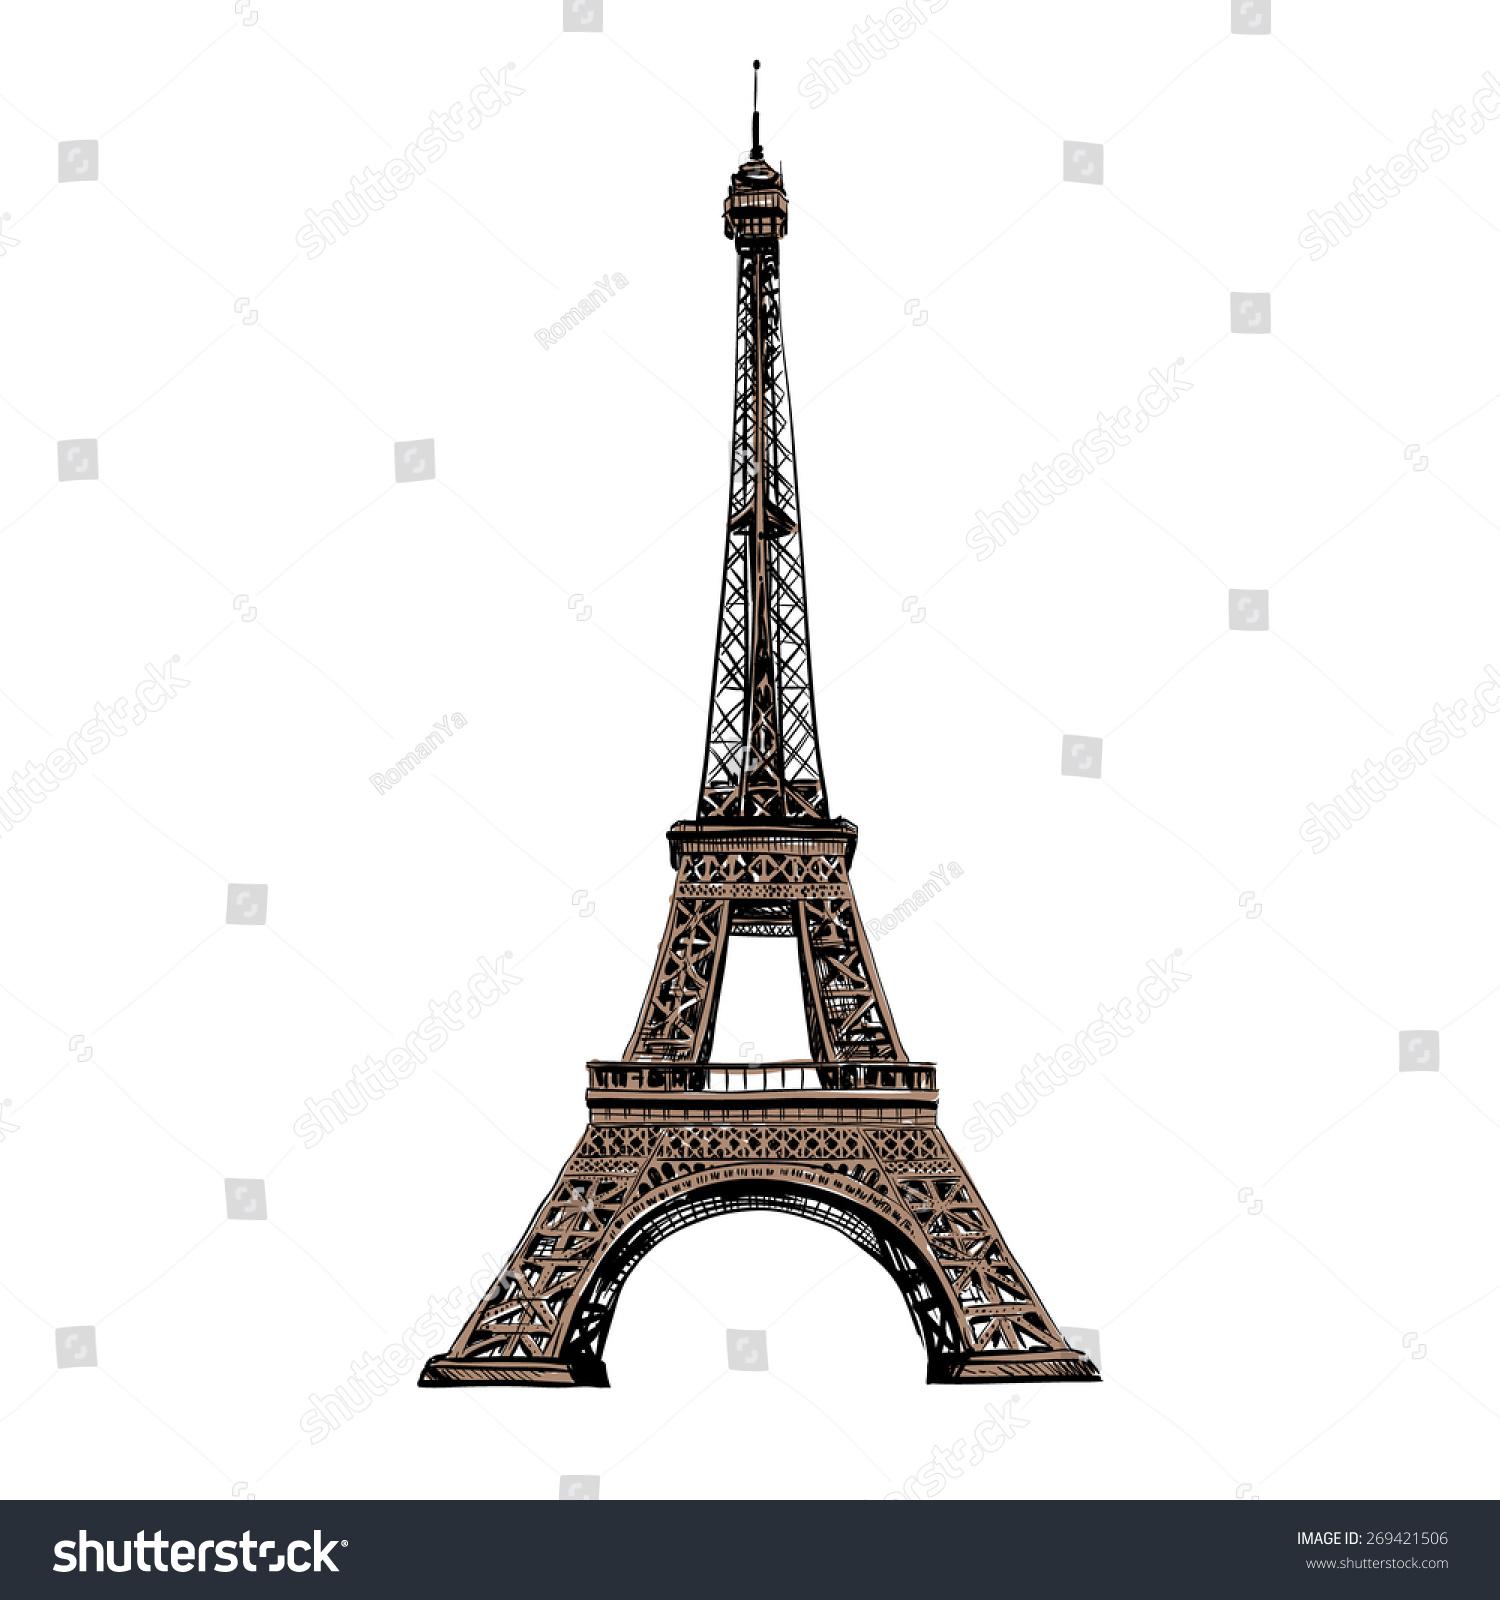 Paris Illustration: Eiffel Tower Paris France Vector Illustration Stock Vector